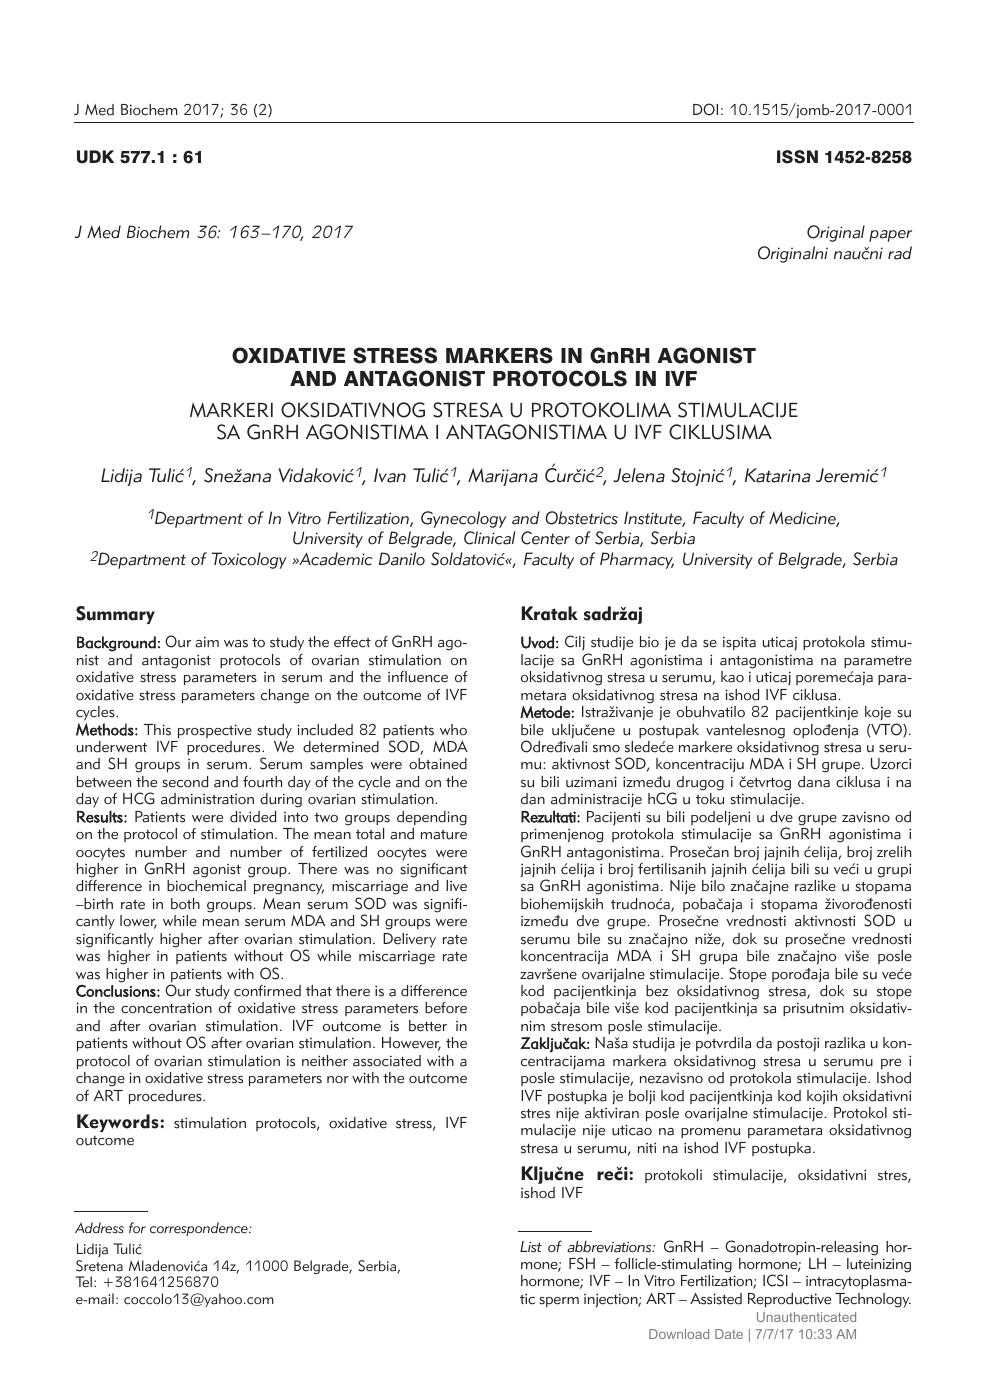 Oxidative Stress Markers in GnRH AgonistaAnd Antagonist